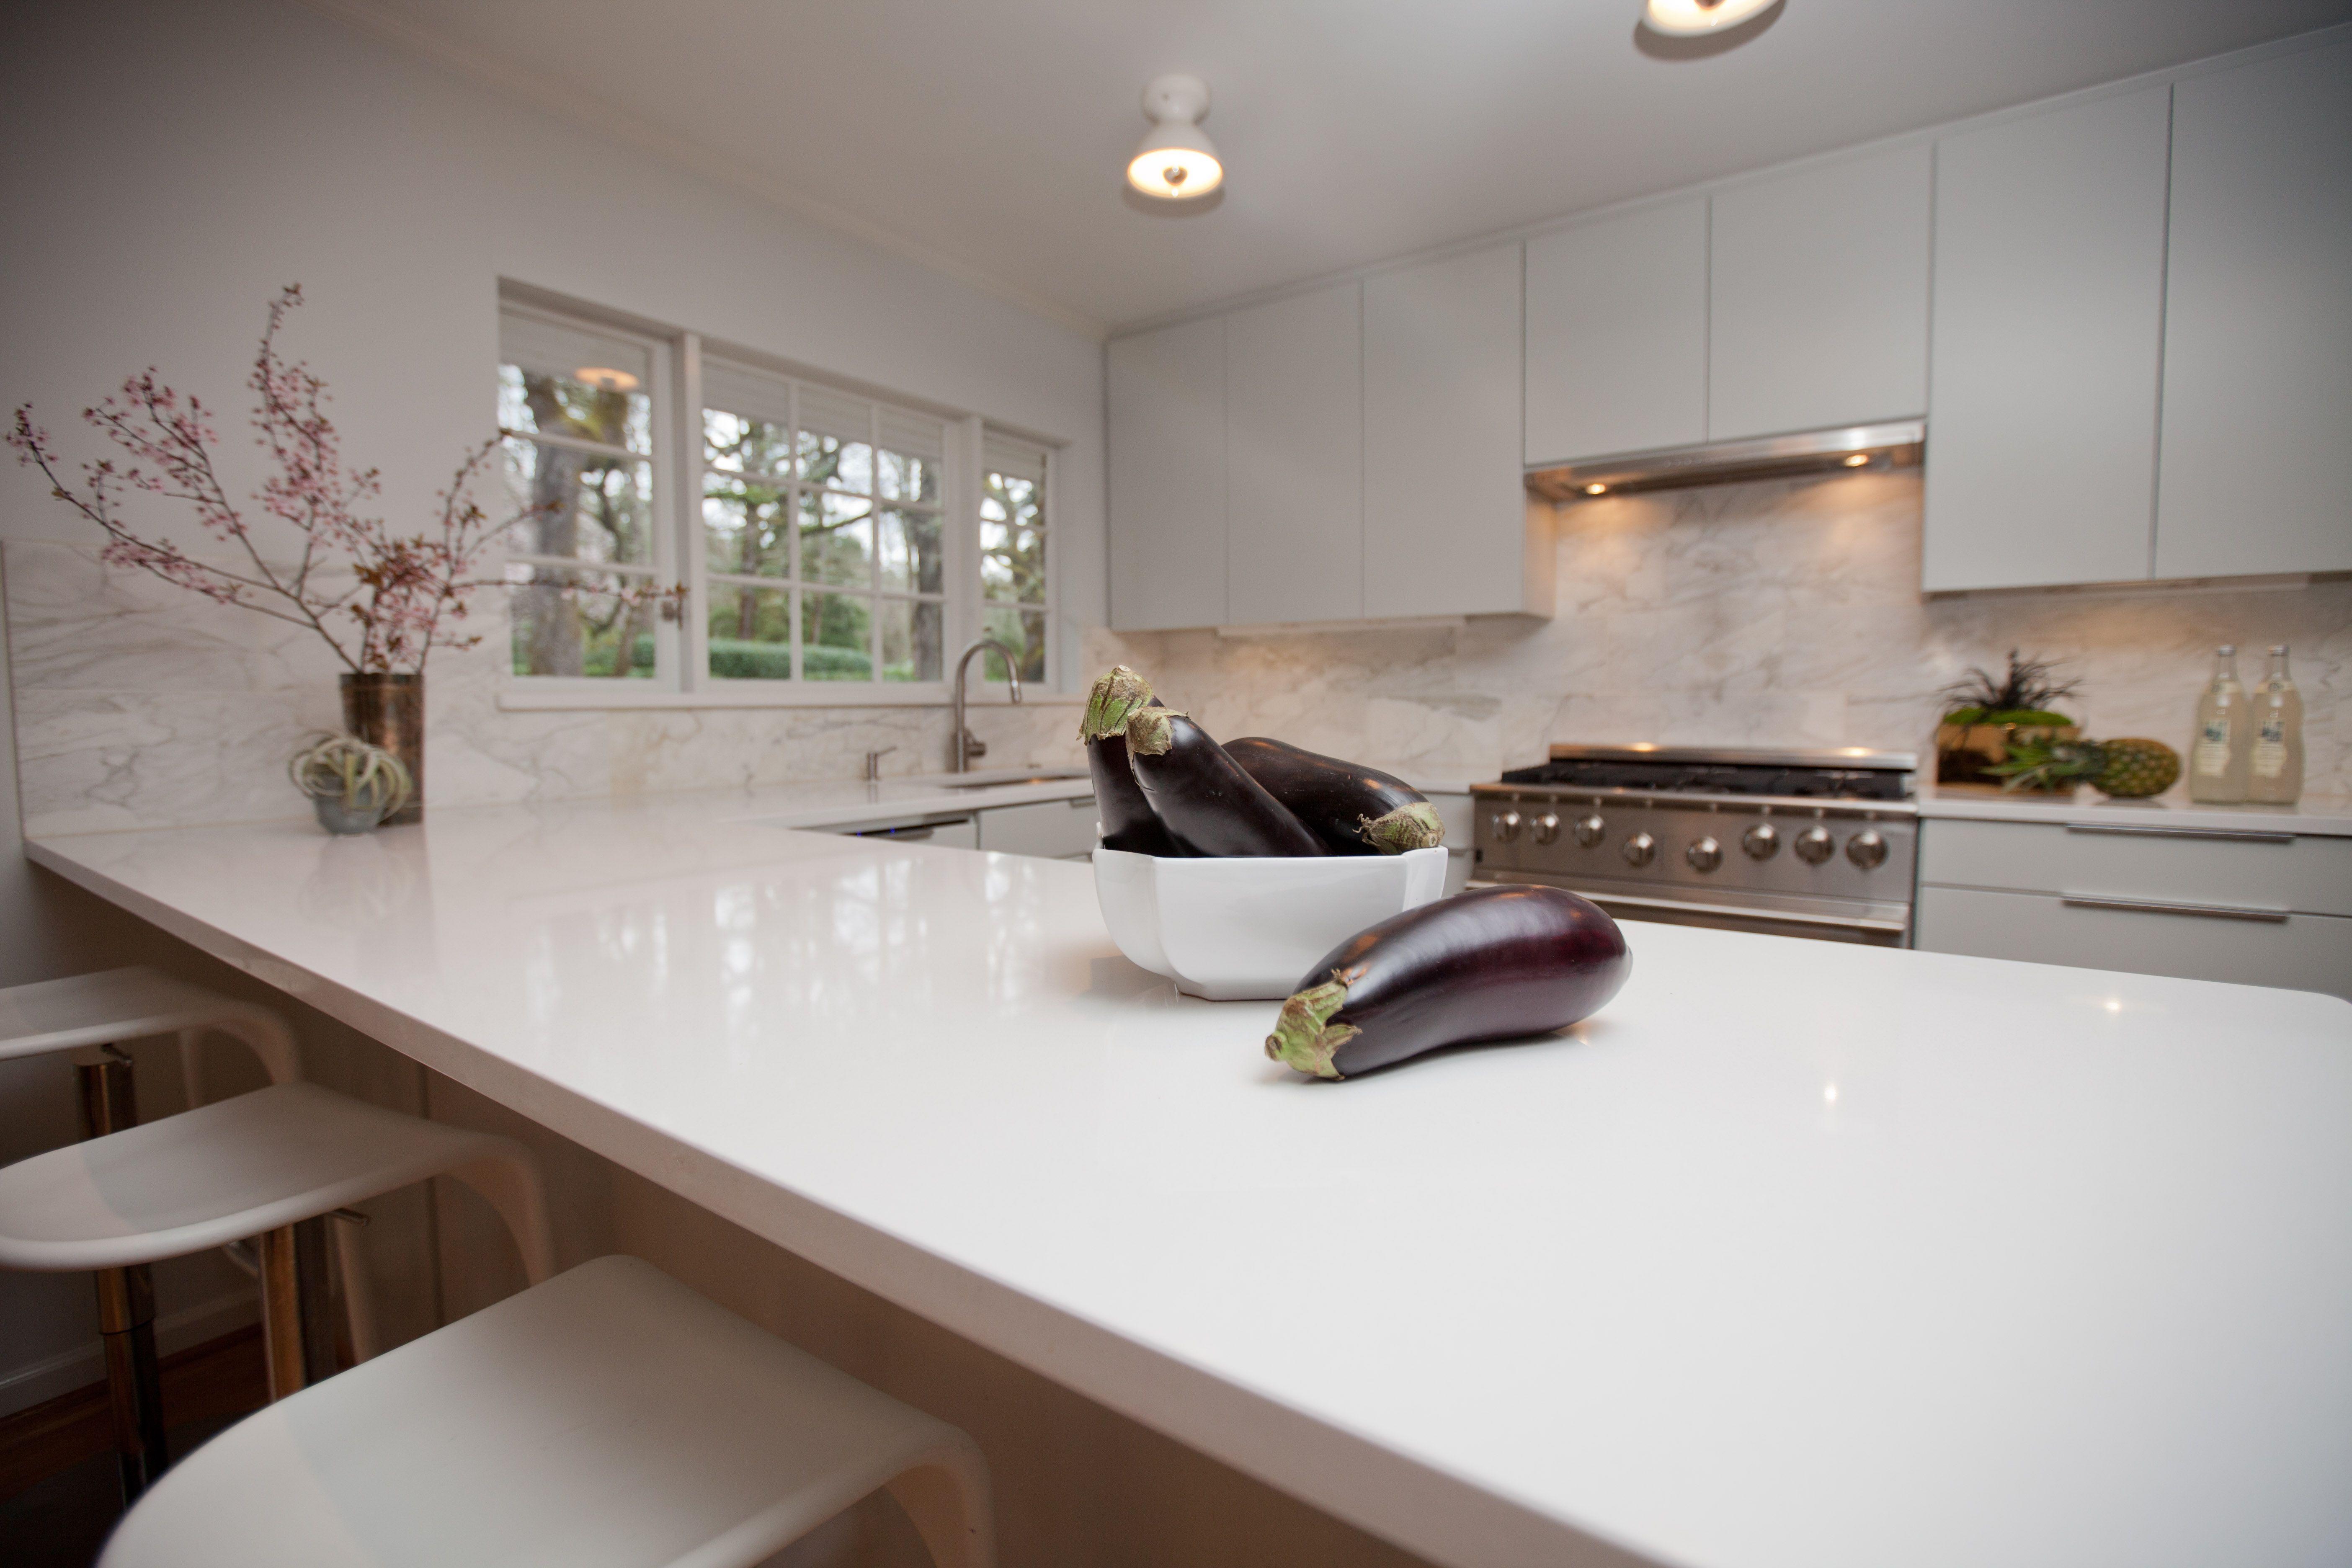 White Quartz Countertops Google Search White Quartz Countertop Quartz Countertops Cost White Kitchen Remodeling